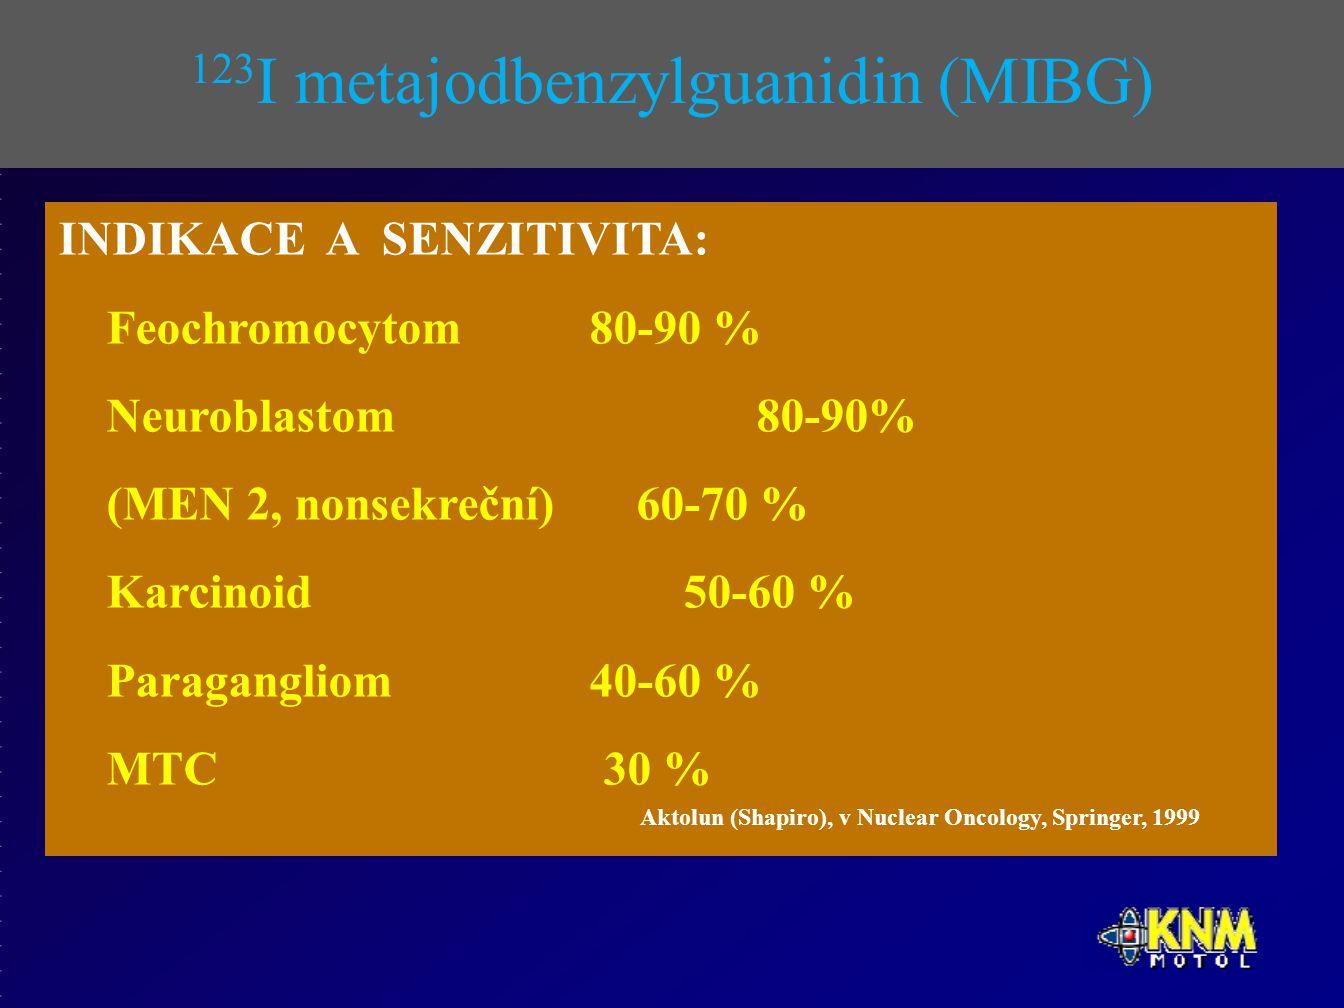 123 I metajodbenzylguanidin (MIBG) INDIKACE A SENZITIVITA: Feochromocytom 80-90 % Neuroblastom 80-90% (MEN 2, nonsekreční) 60-70 % Karcinoid 50-60 % Paragangliom 40-60 % MTC 30 % Aktolun (Shapiro), v Nuclear Oncology, Springer, 1999